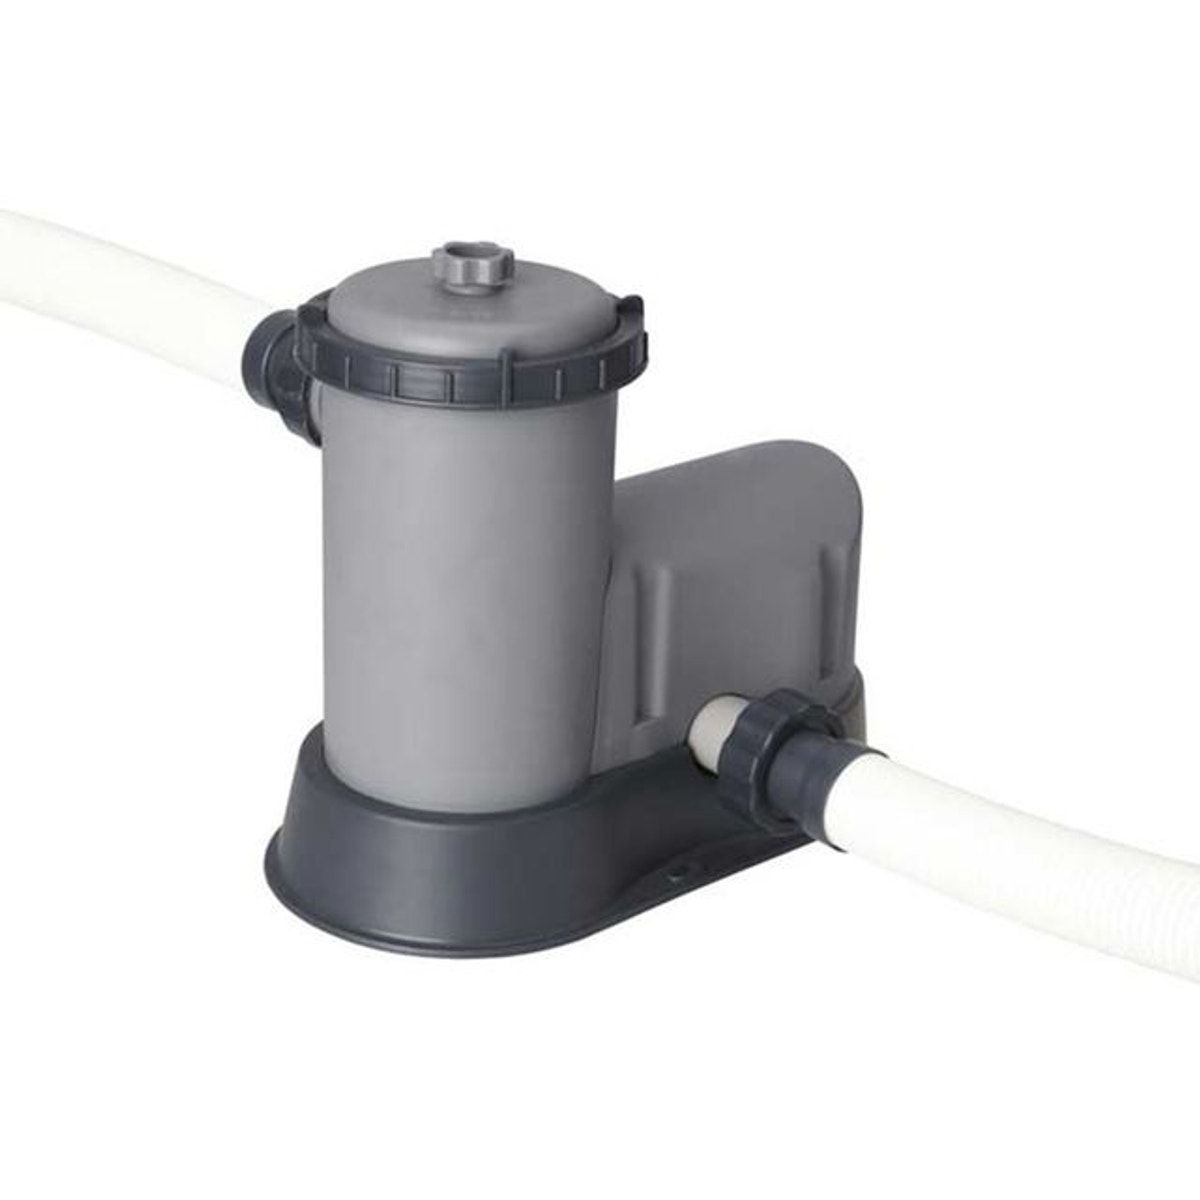 Piscine Tubulaire Ronde Bestway Power Steel 4 88 X 1 22 Products